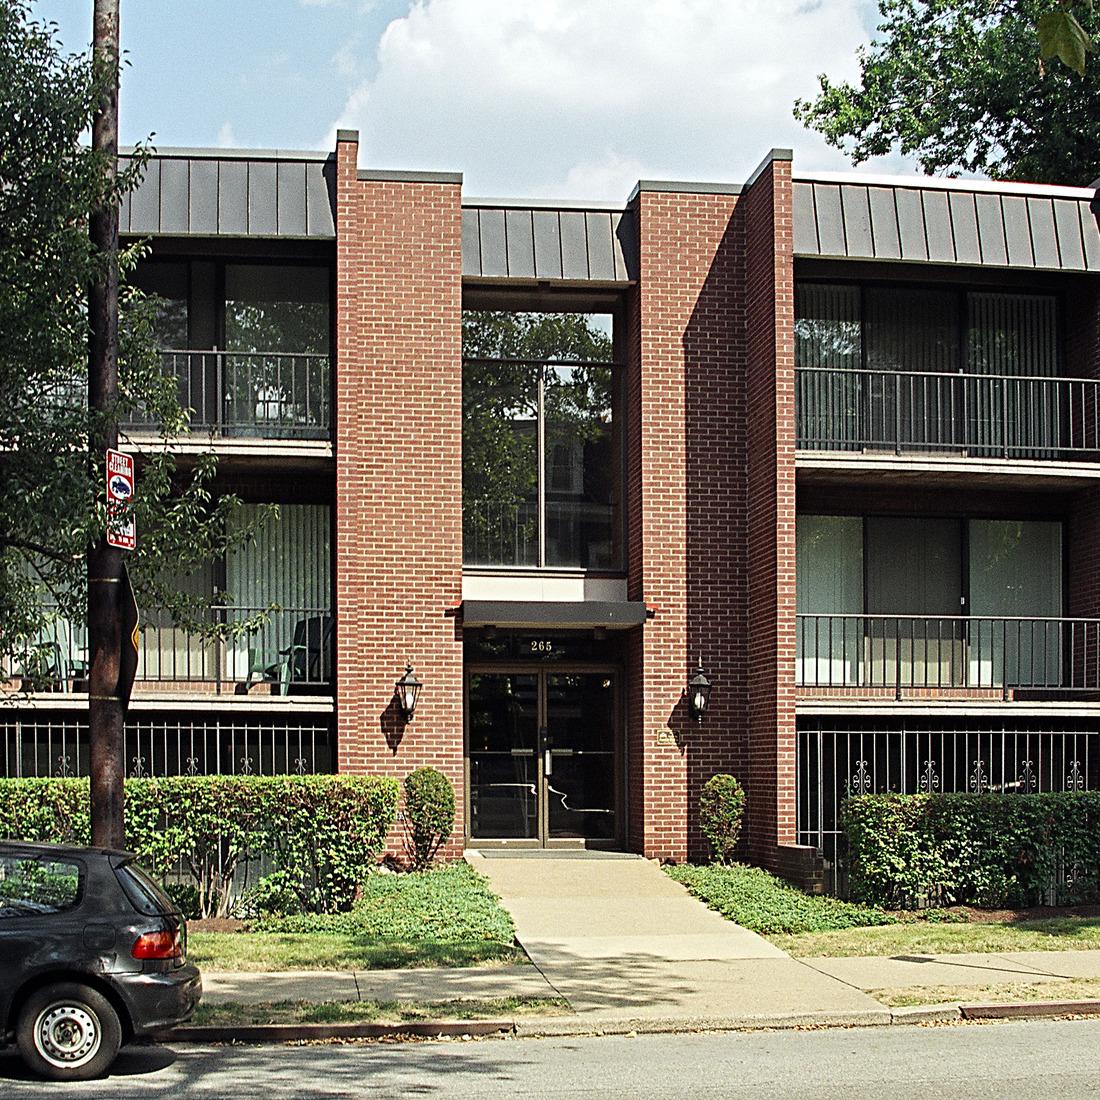 Shadyside Apartments: 265 Shady Avenue